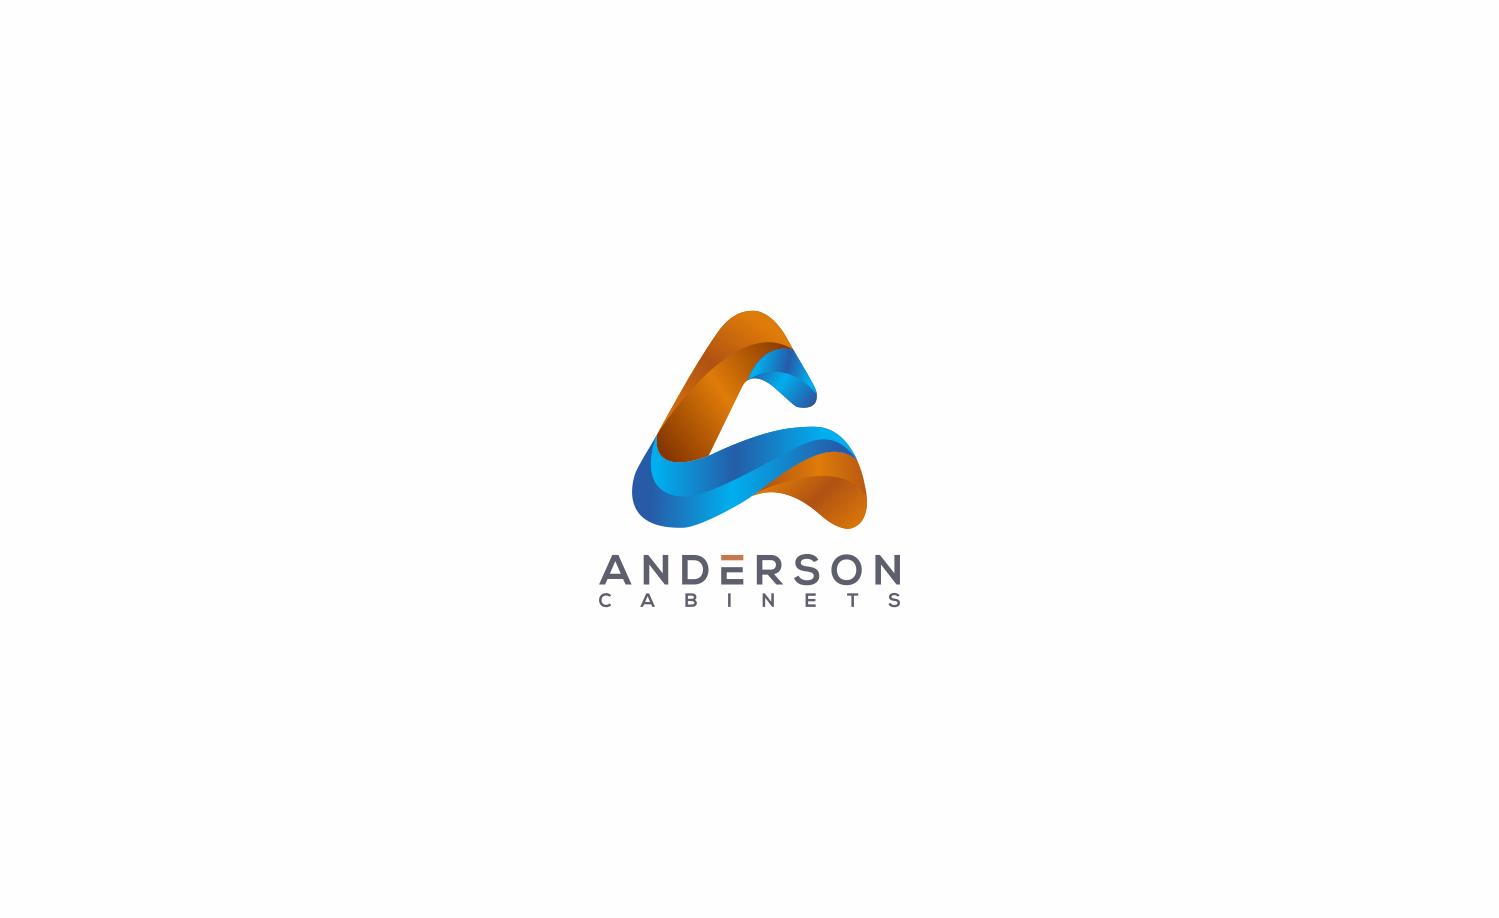 Logo Design By Gentapradipta979 For Anderson Cabinets   Design #17083893